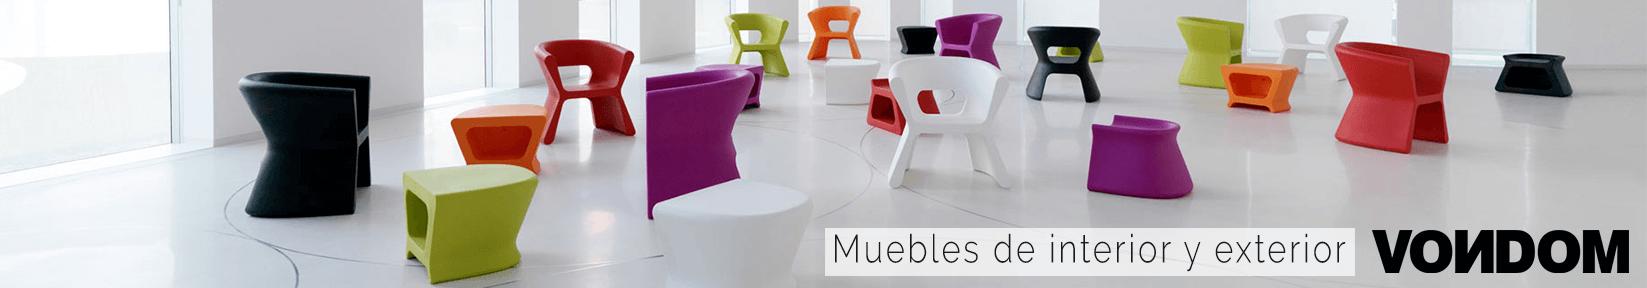 muebles de diseño Vondom